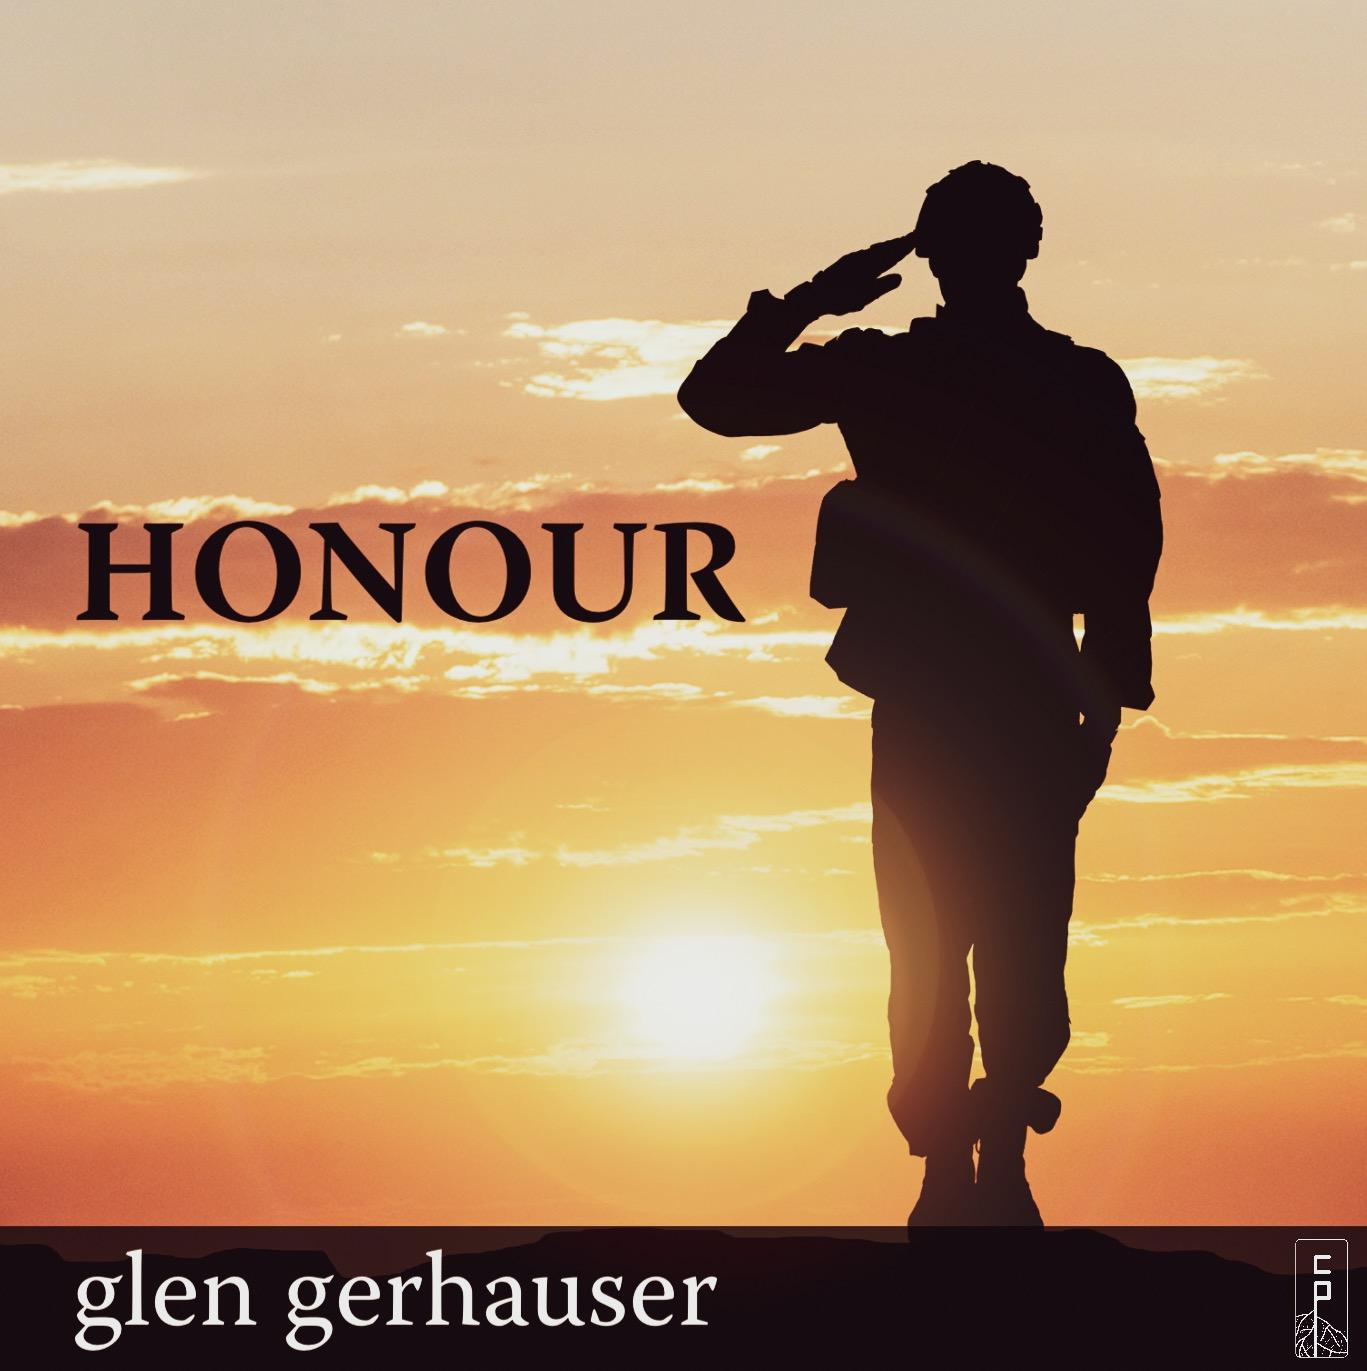 HonourGlenGerhauser.JPG